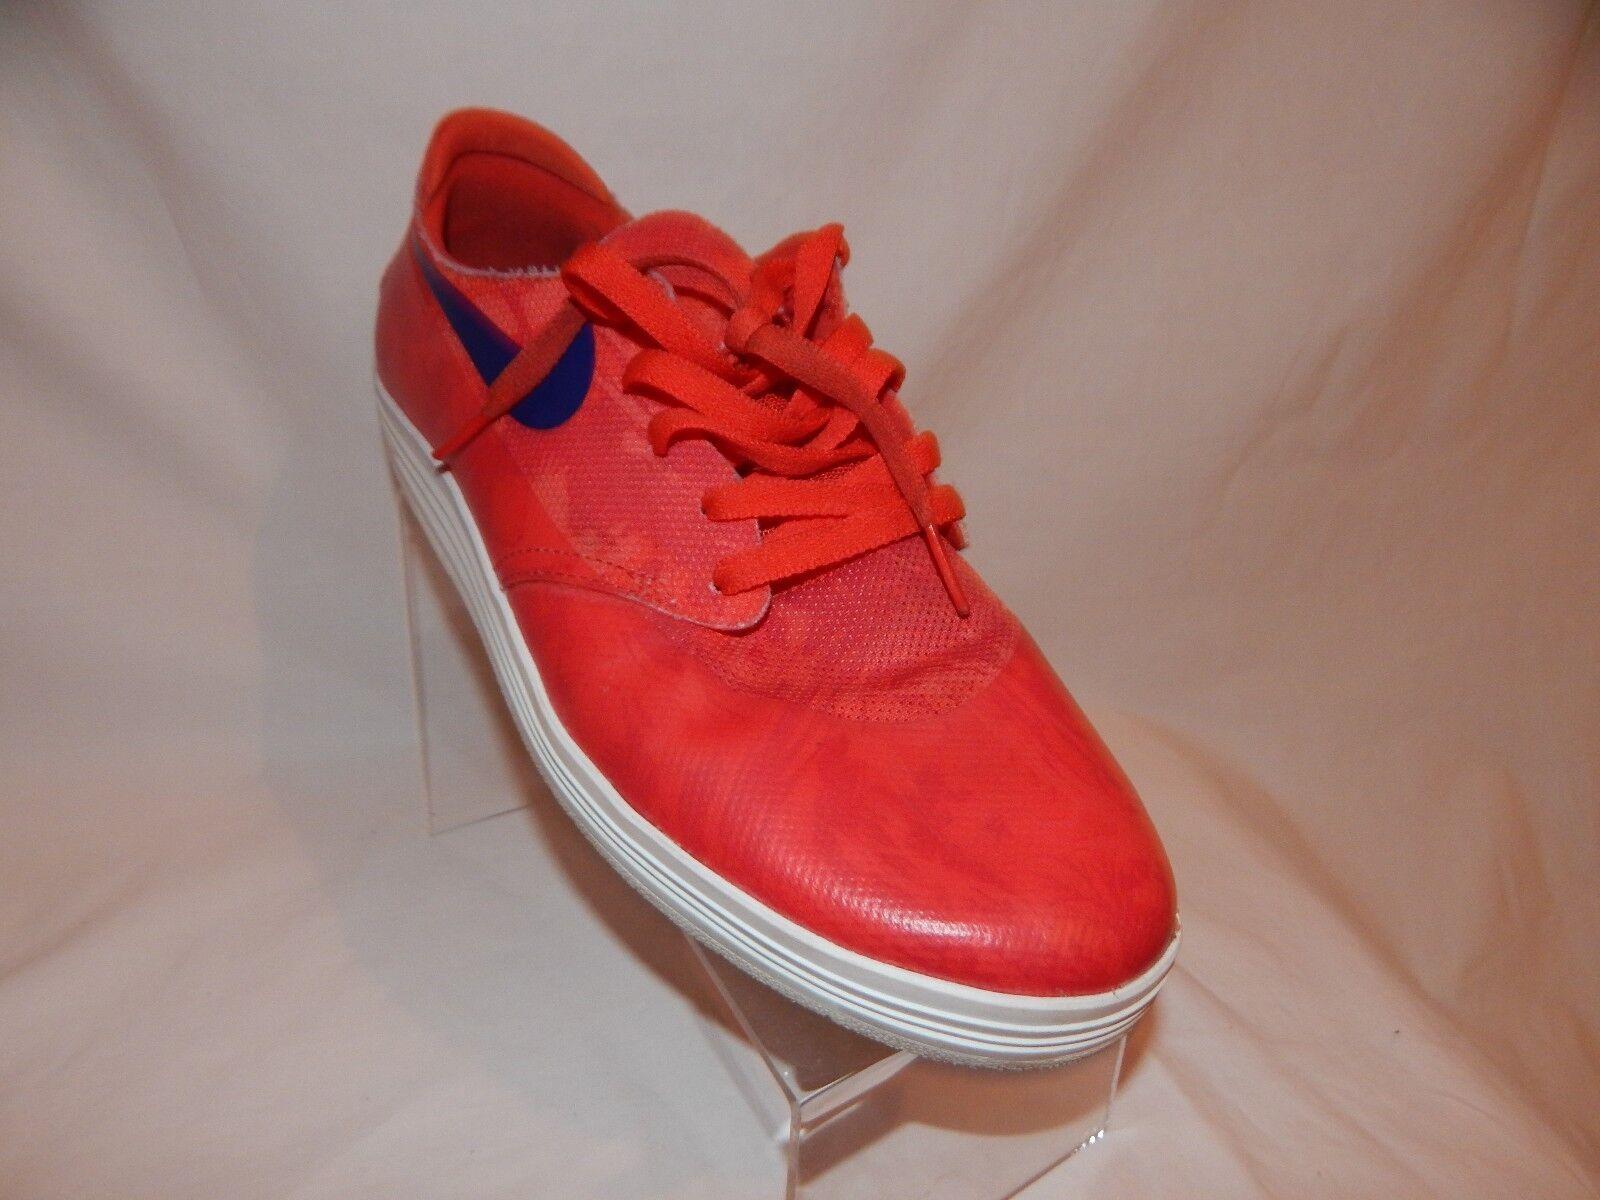 Nike Men's Lunar Oneshot SB WC World Cup Skateboarding Shoes 645019-604 Price reduction Seasonal clearance sale